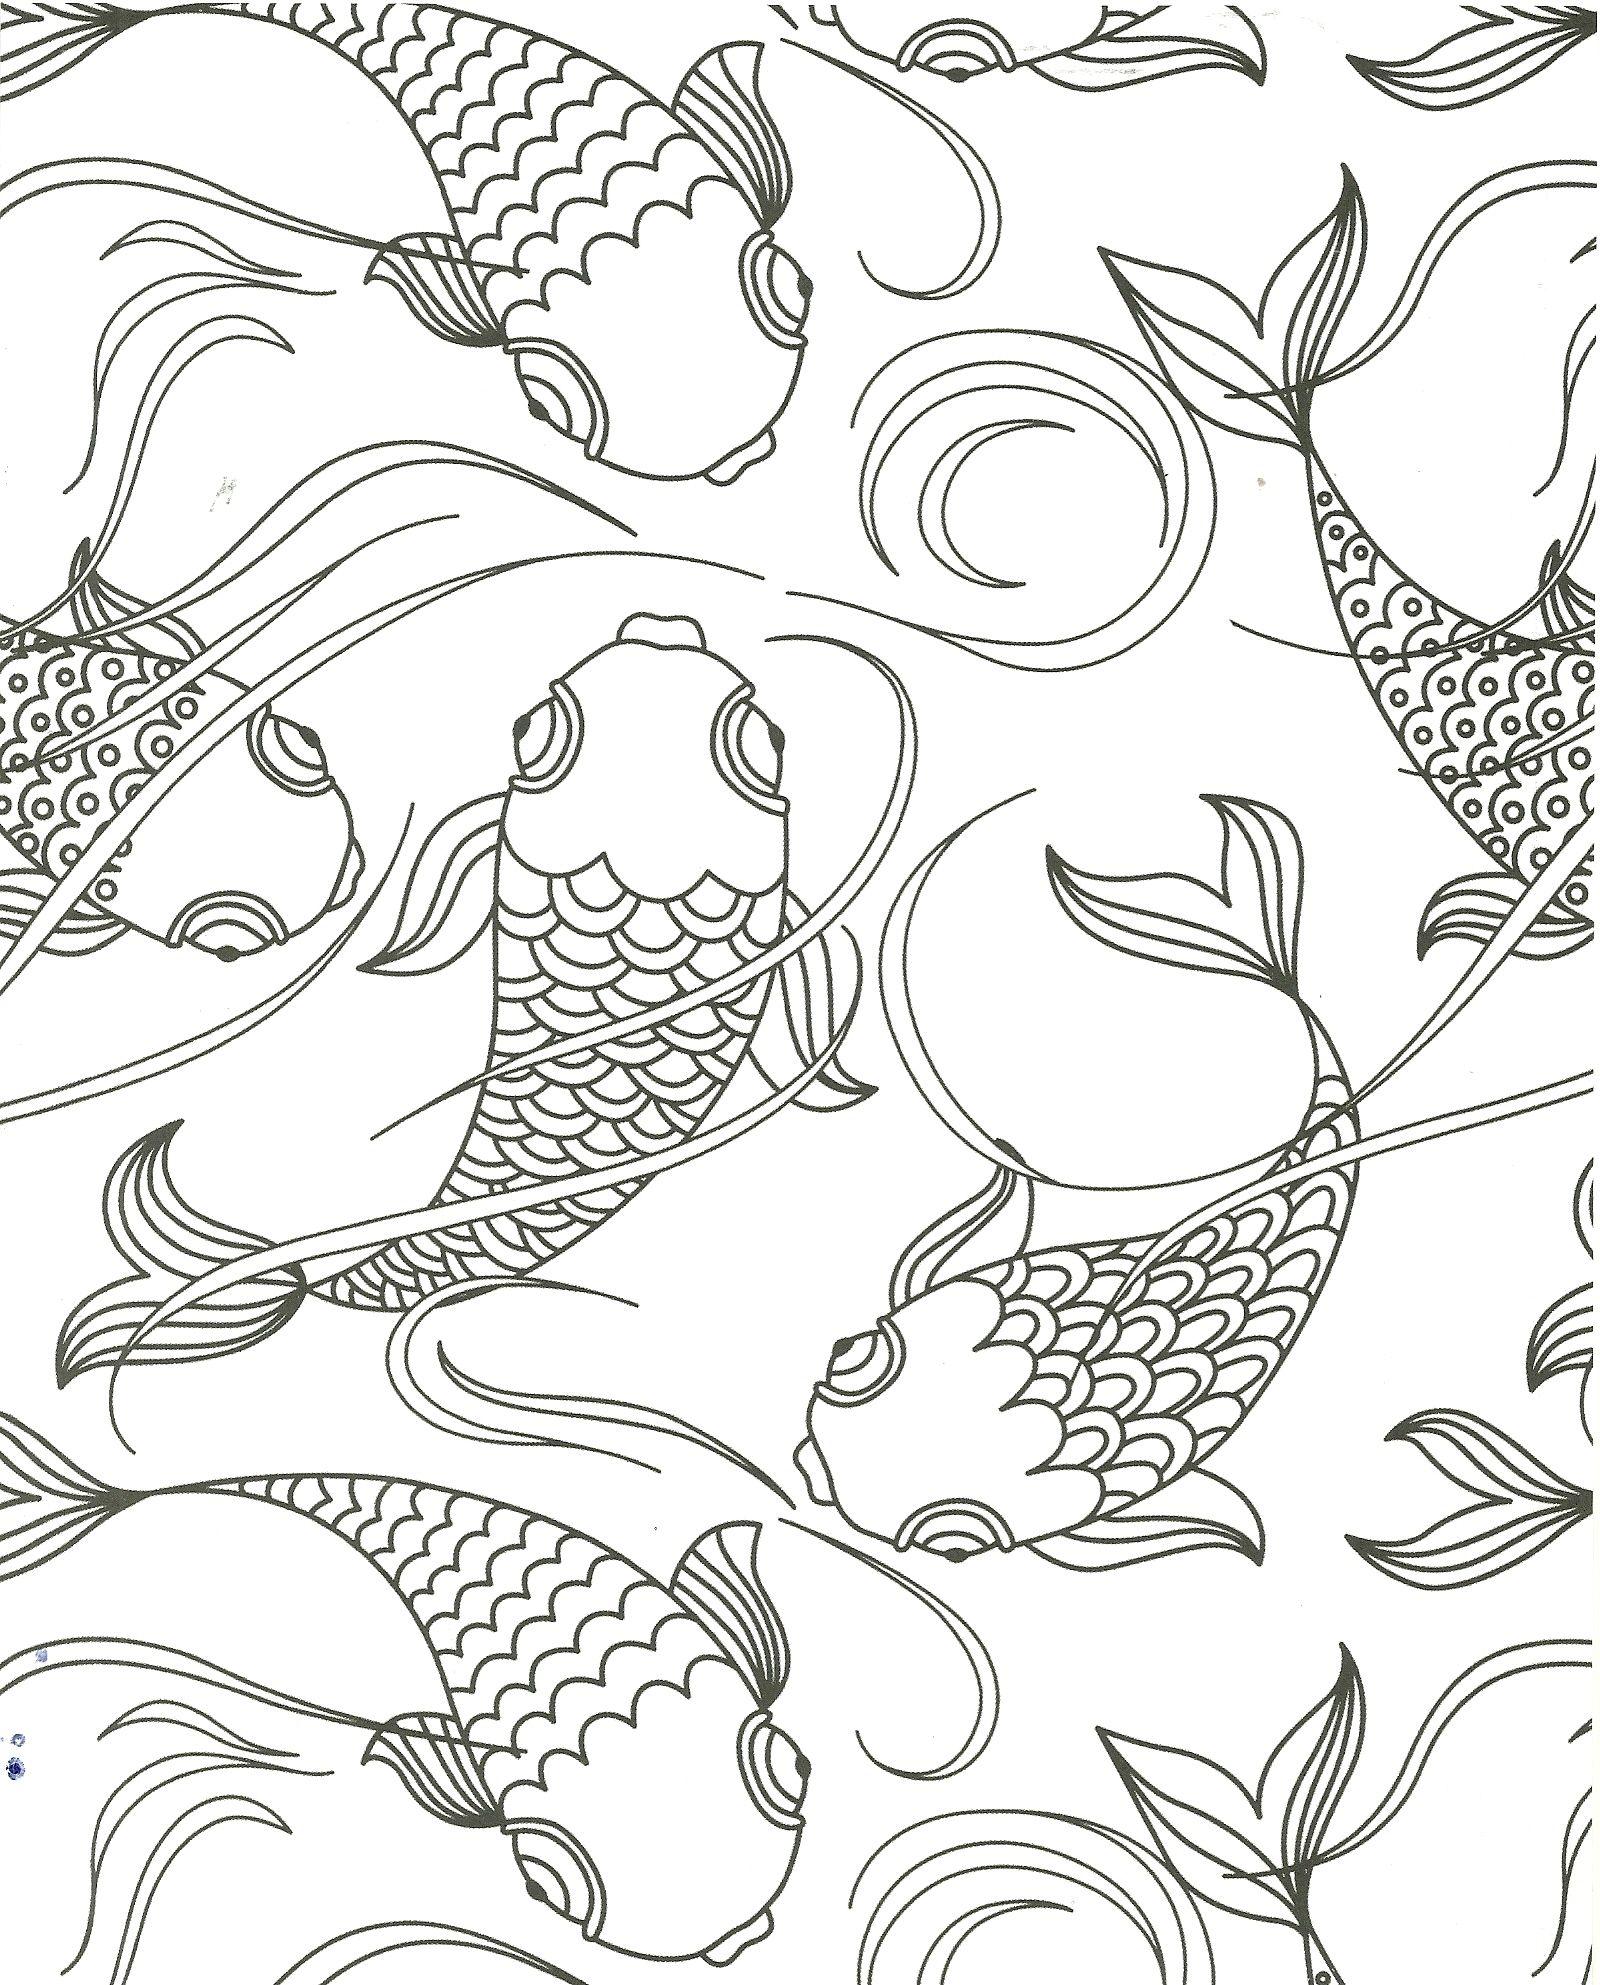 Koi Pond Fish Coloring Page Fish Coloring Page Koi Fish Colors